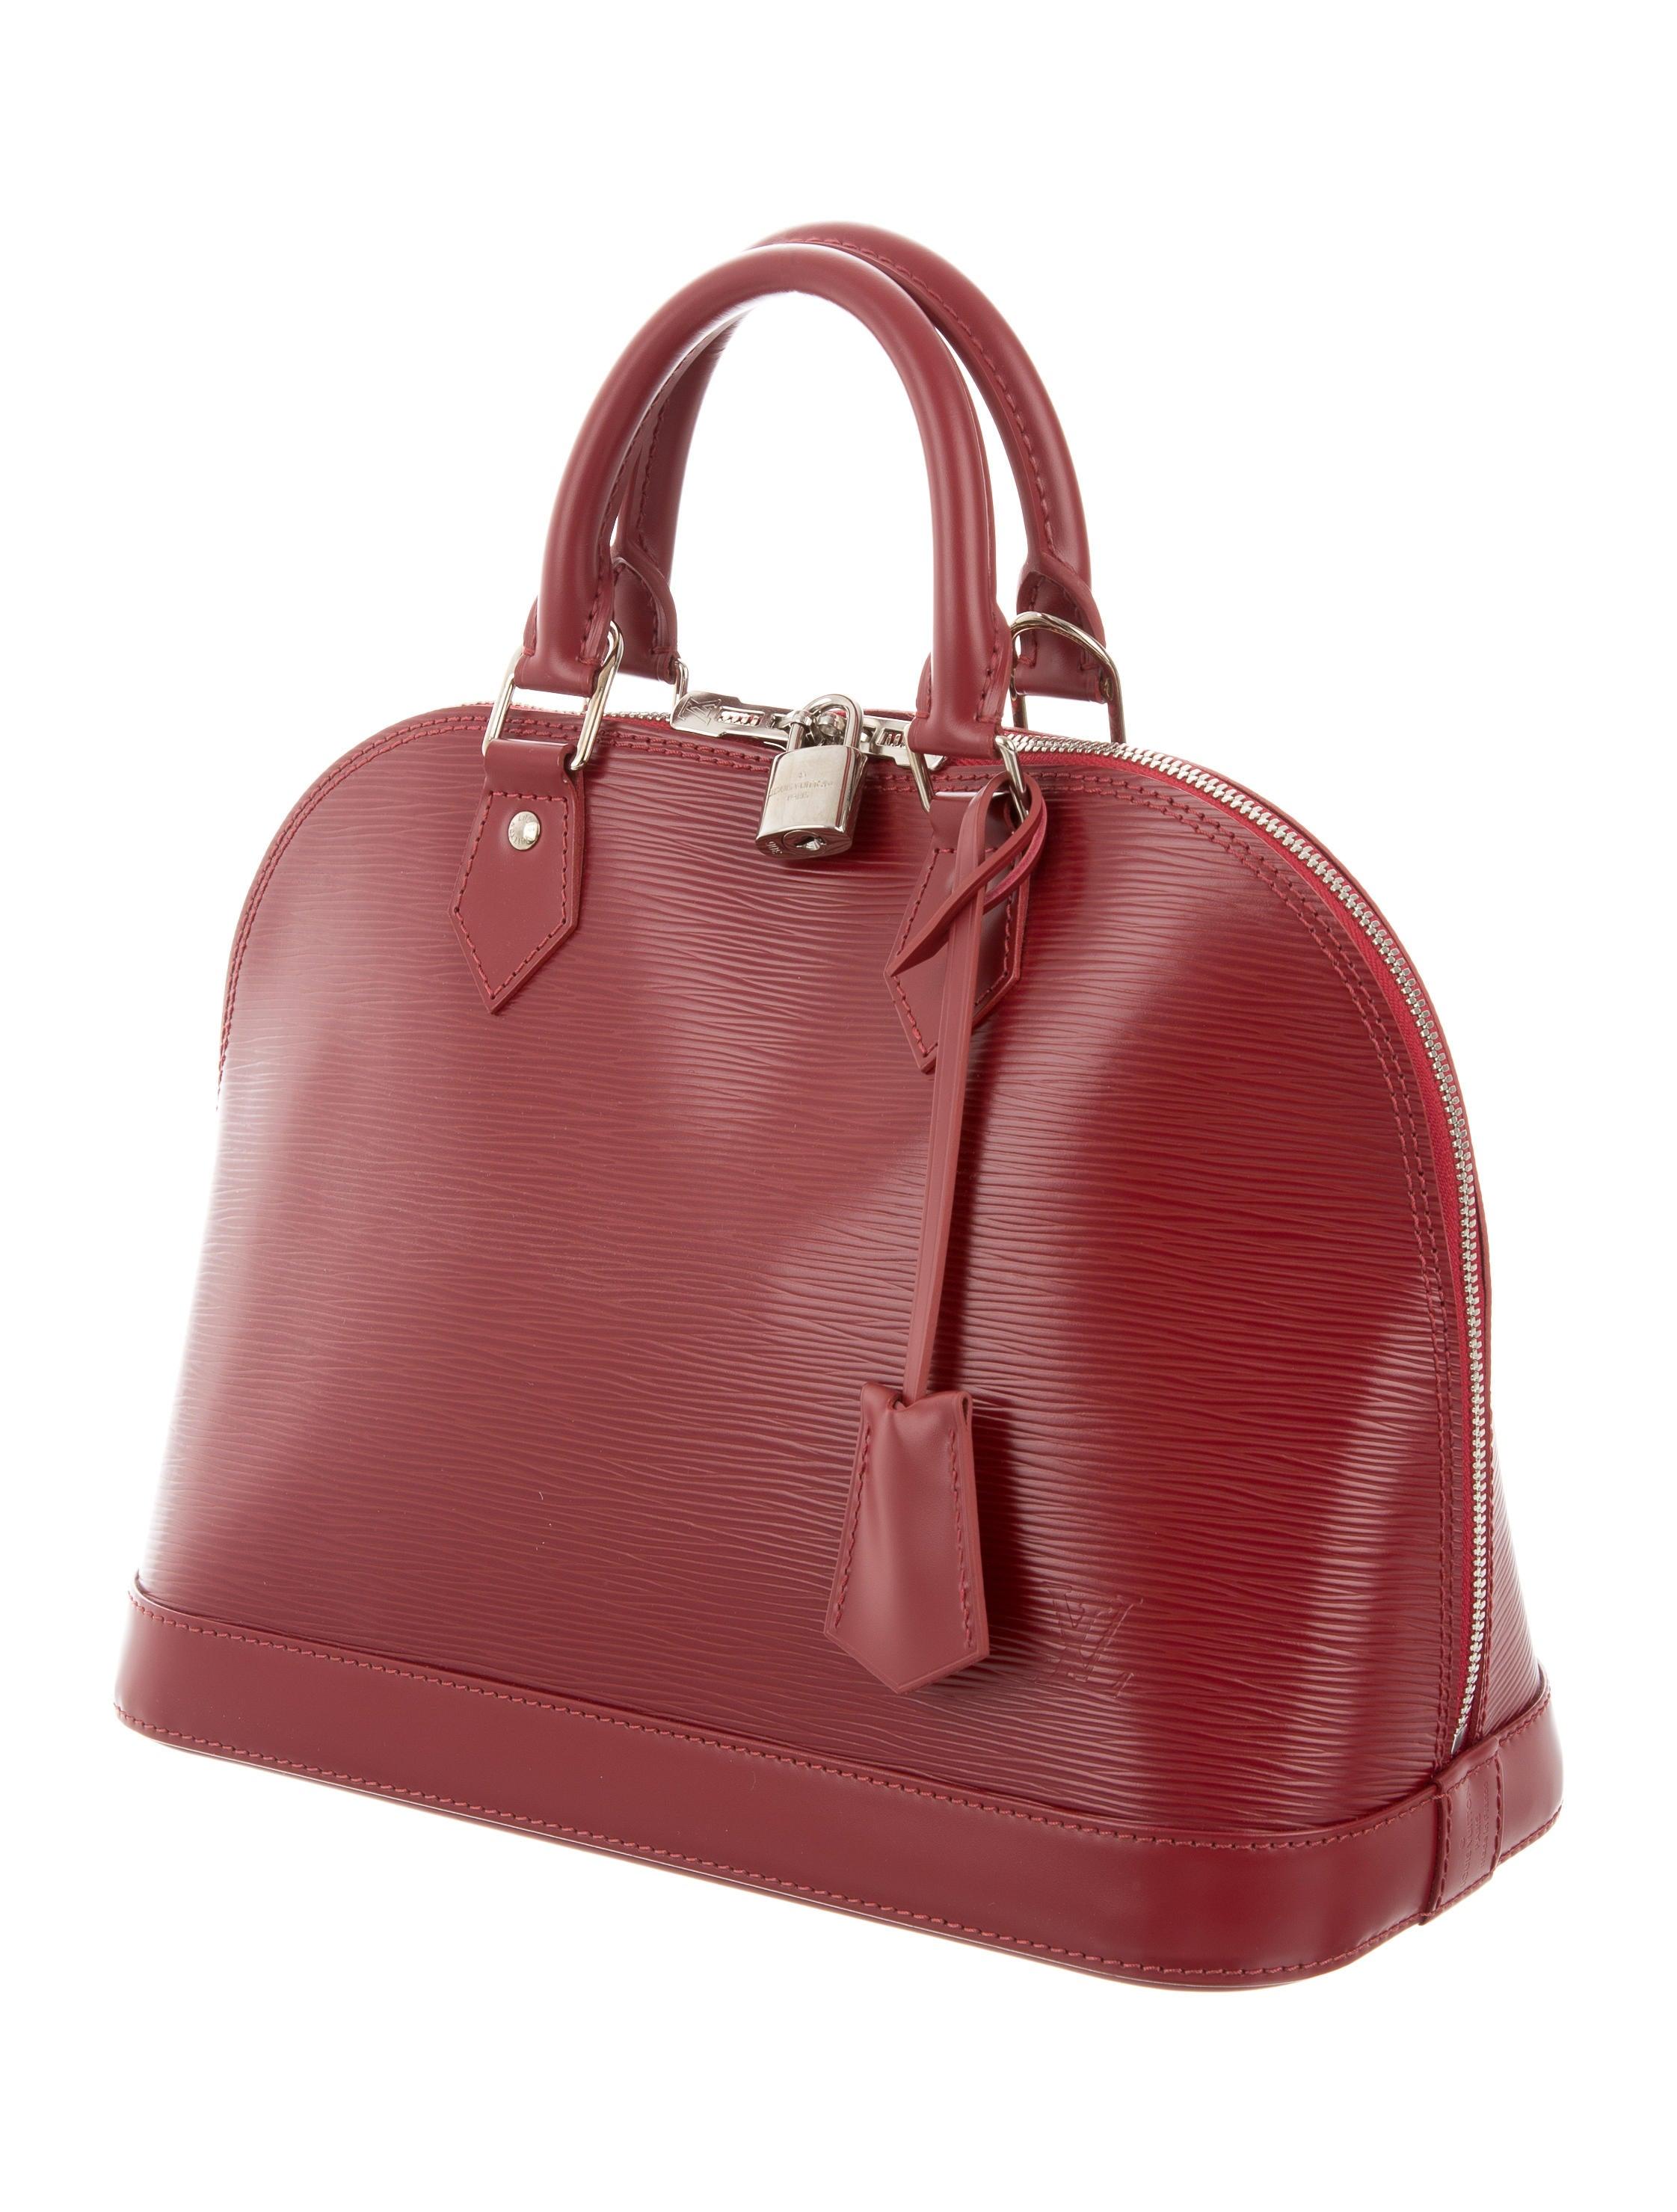 20ea29c844c Louis Vuitton Epi Alma Pm